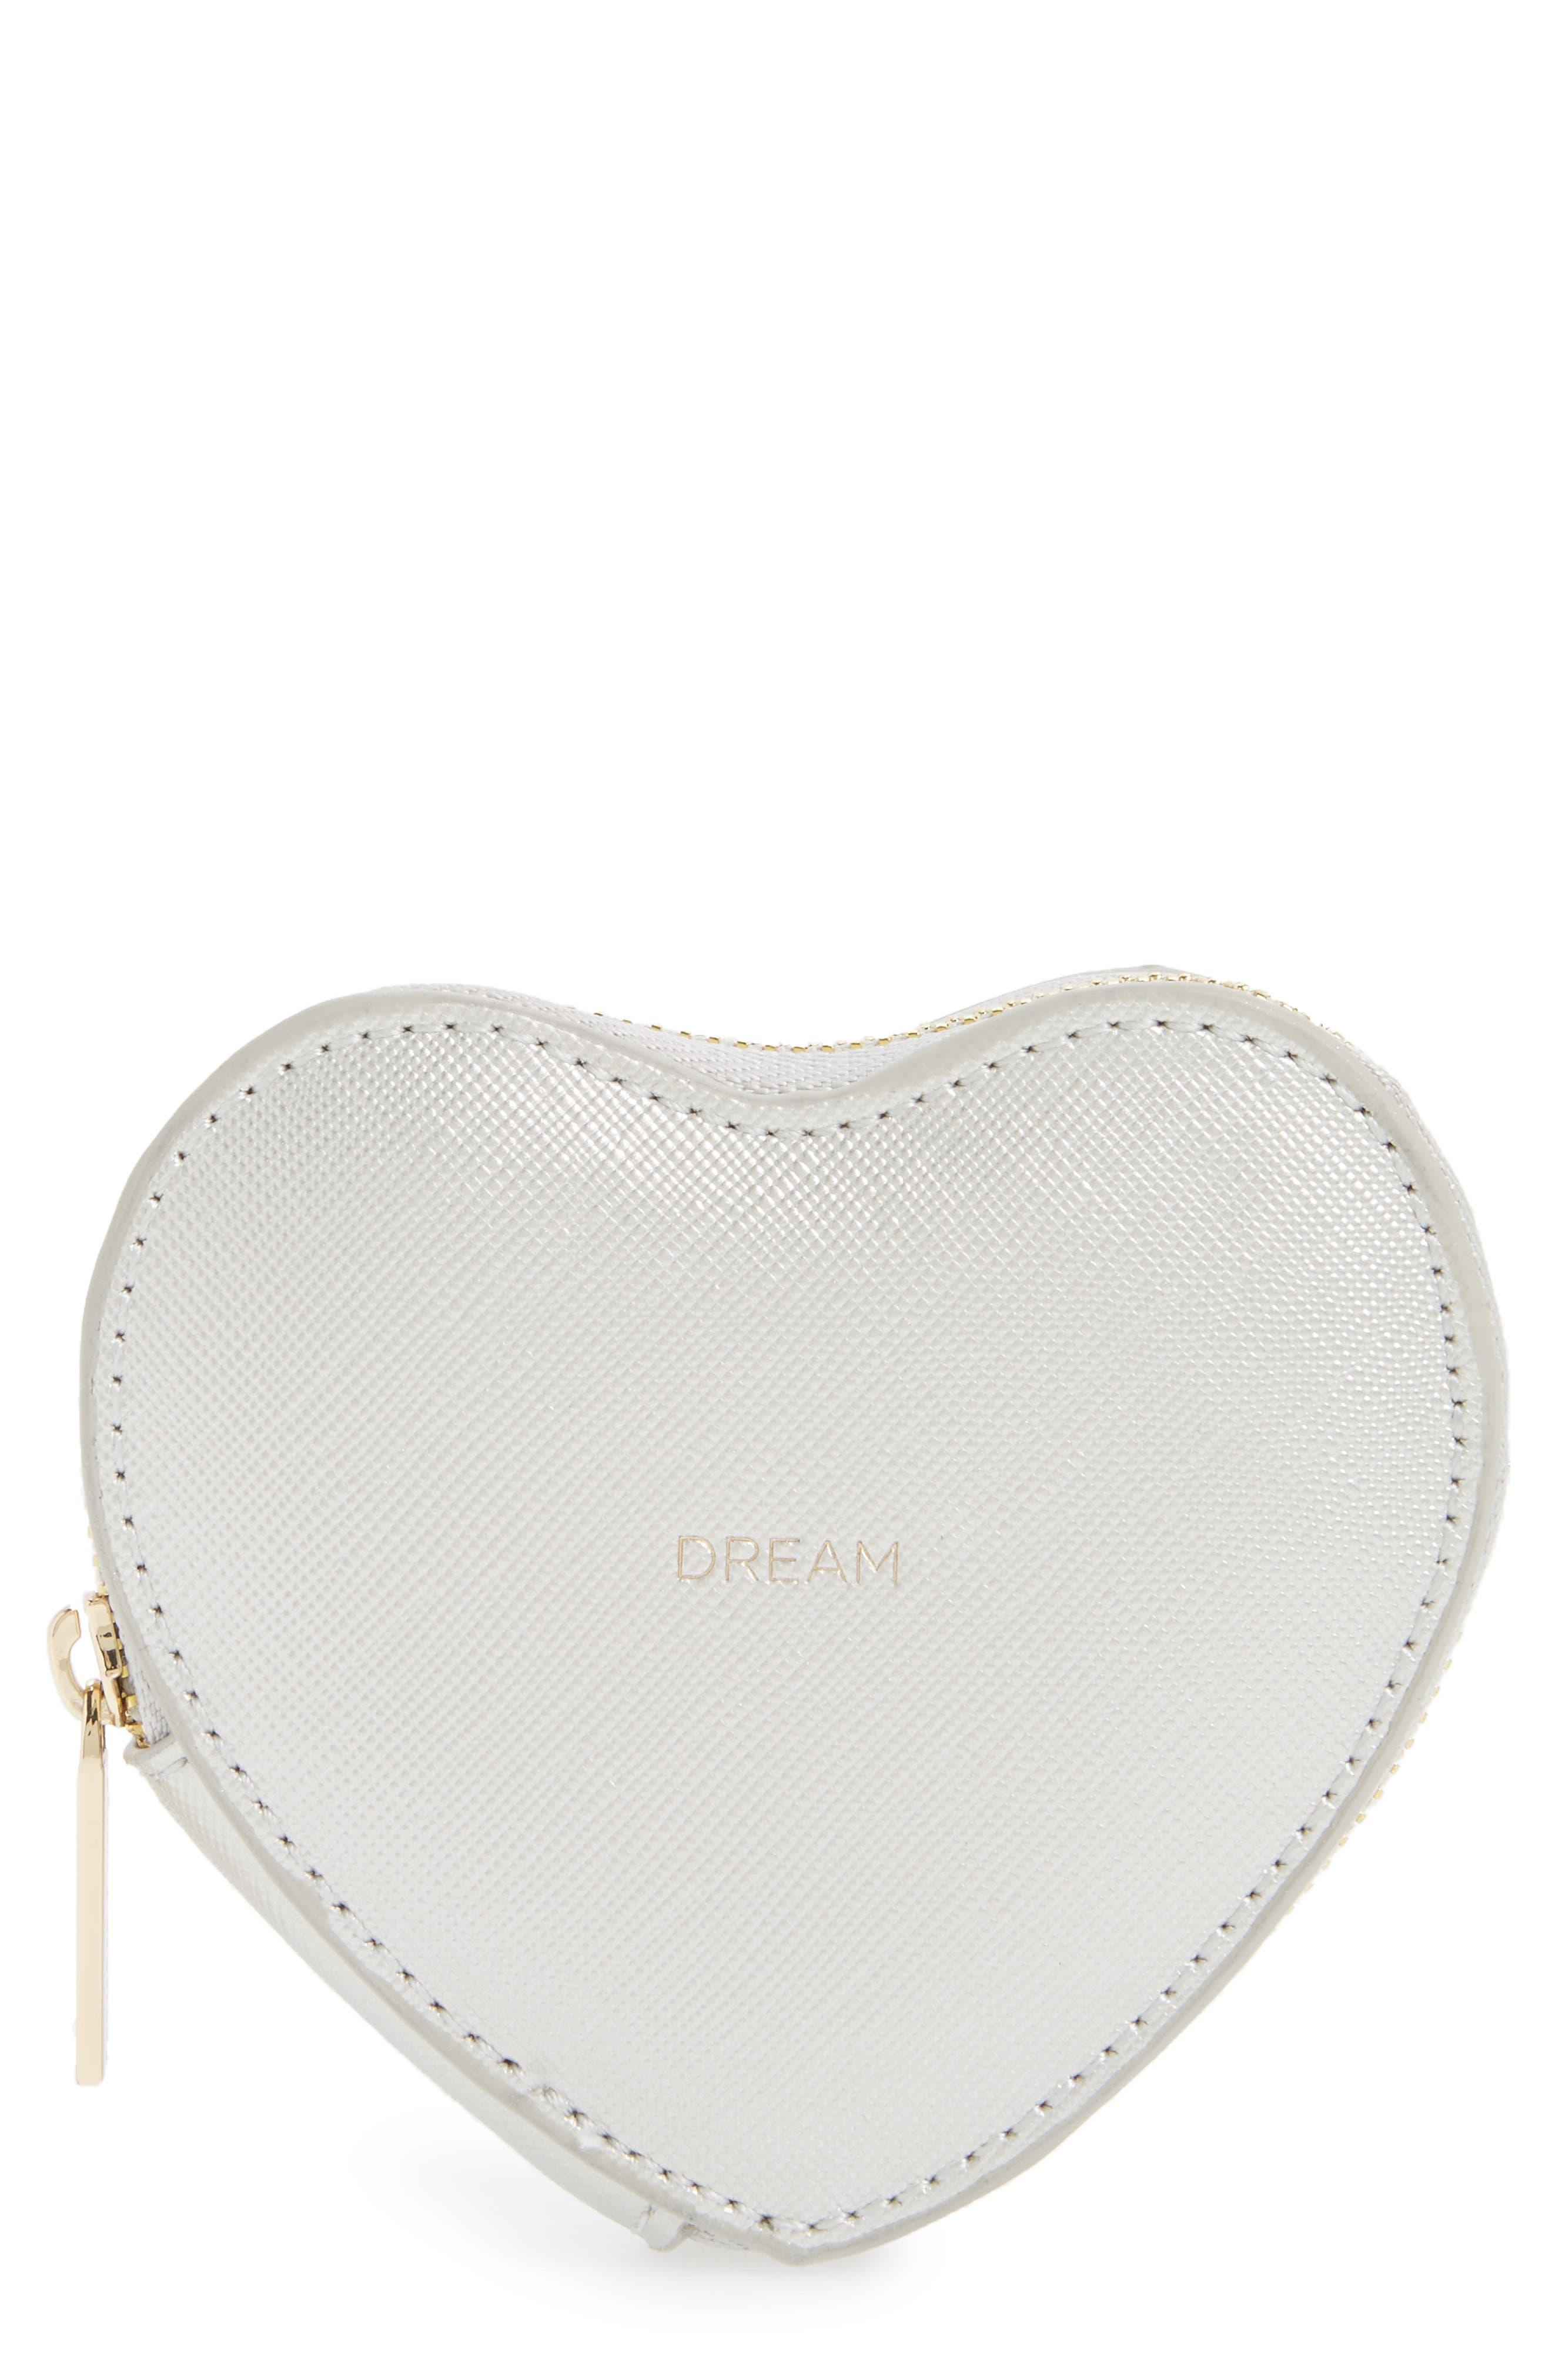 Main Image - Estella Bartlett Heart Dream Faux Leather Coin Purse